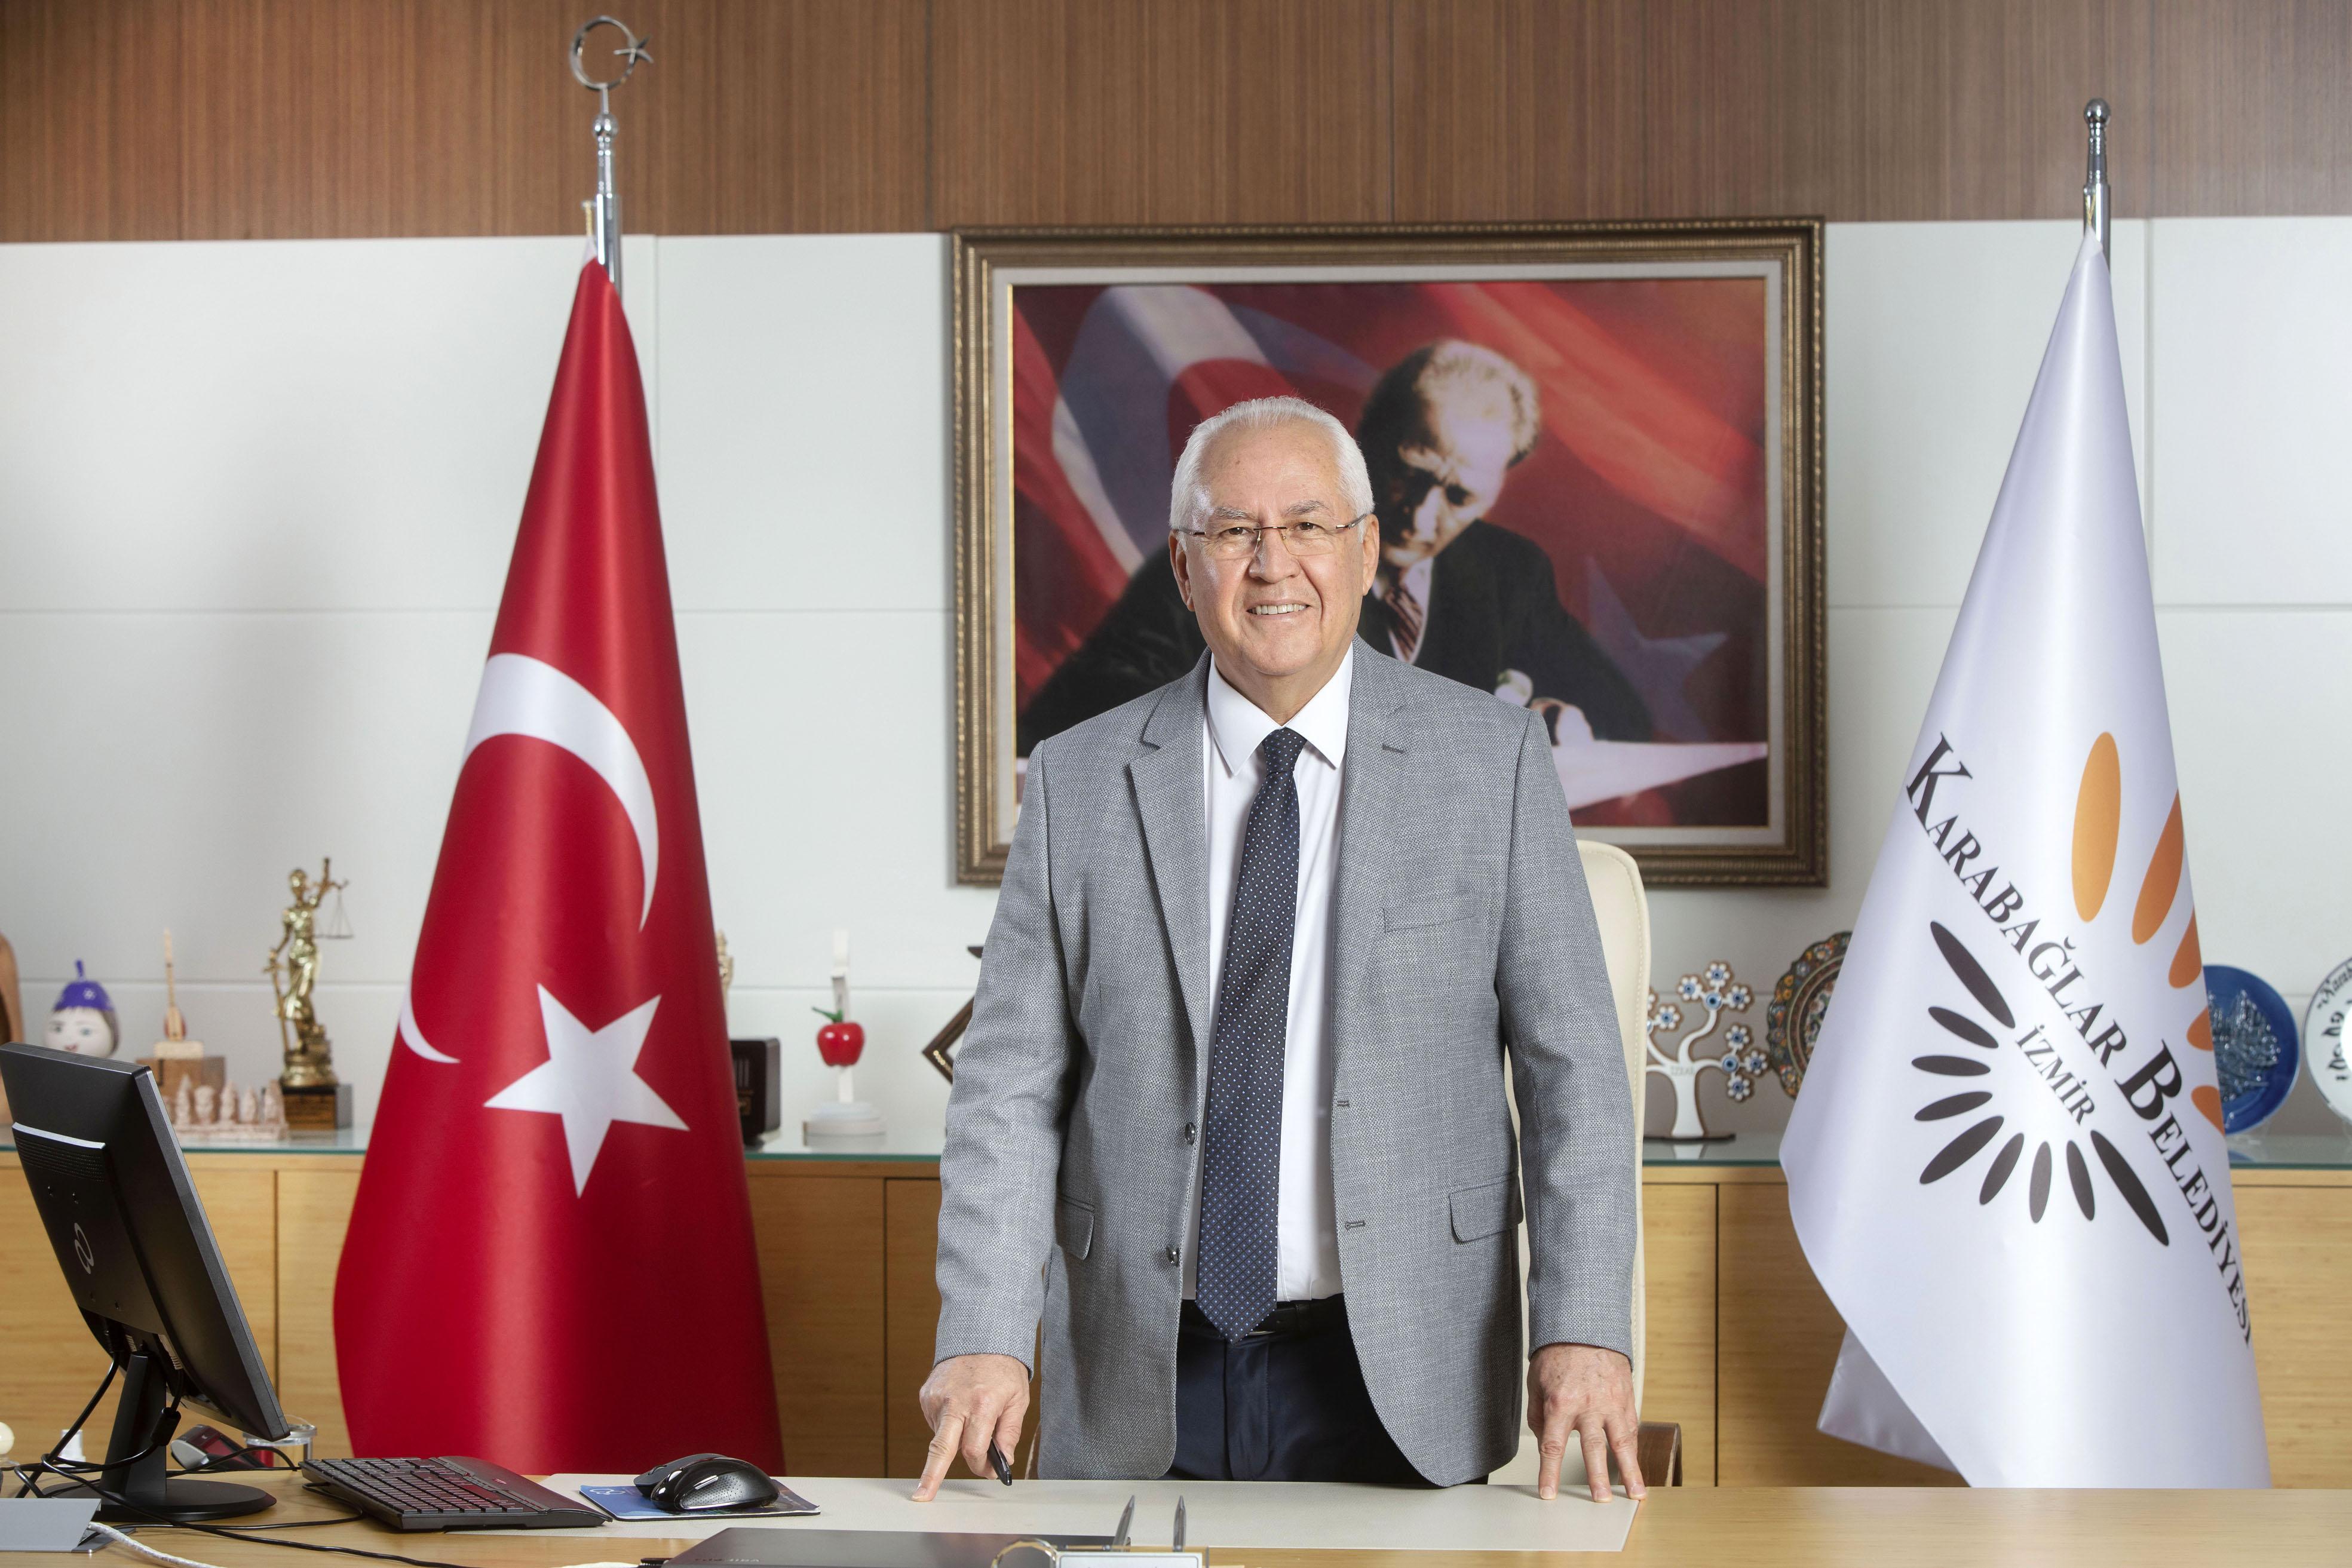 başkan foto-1